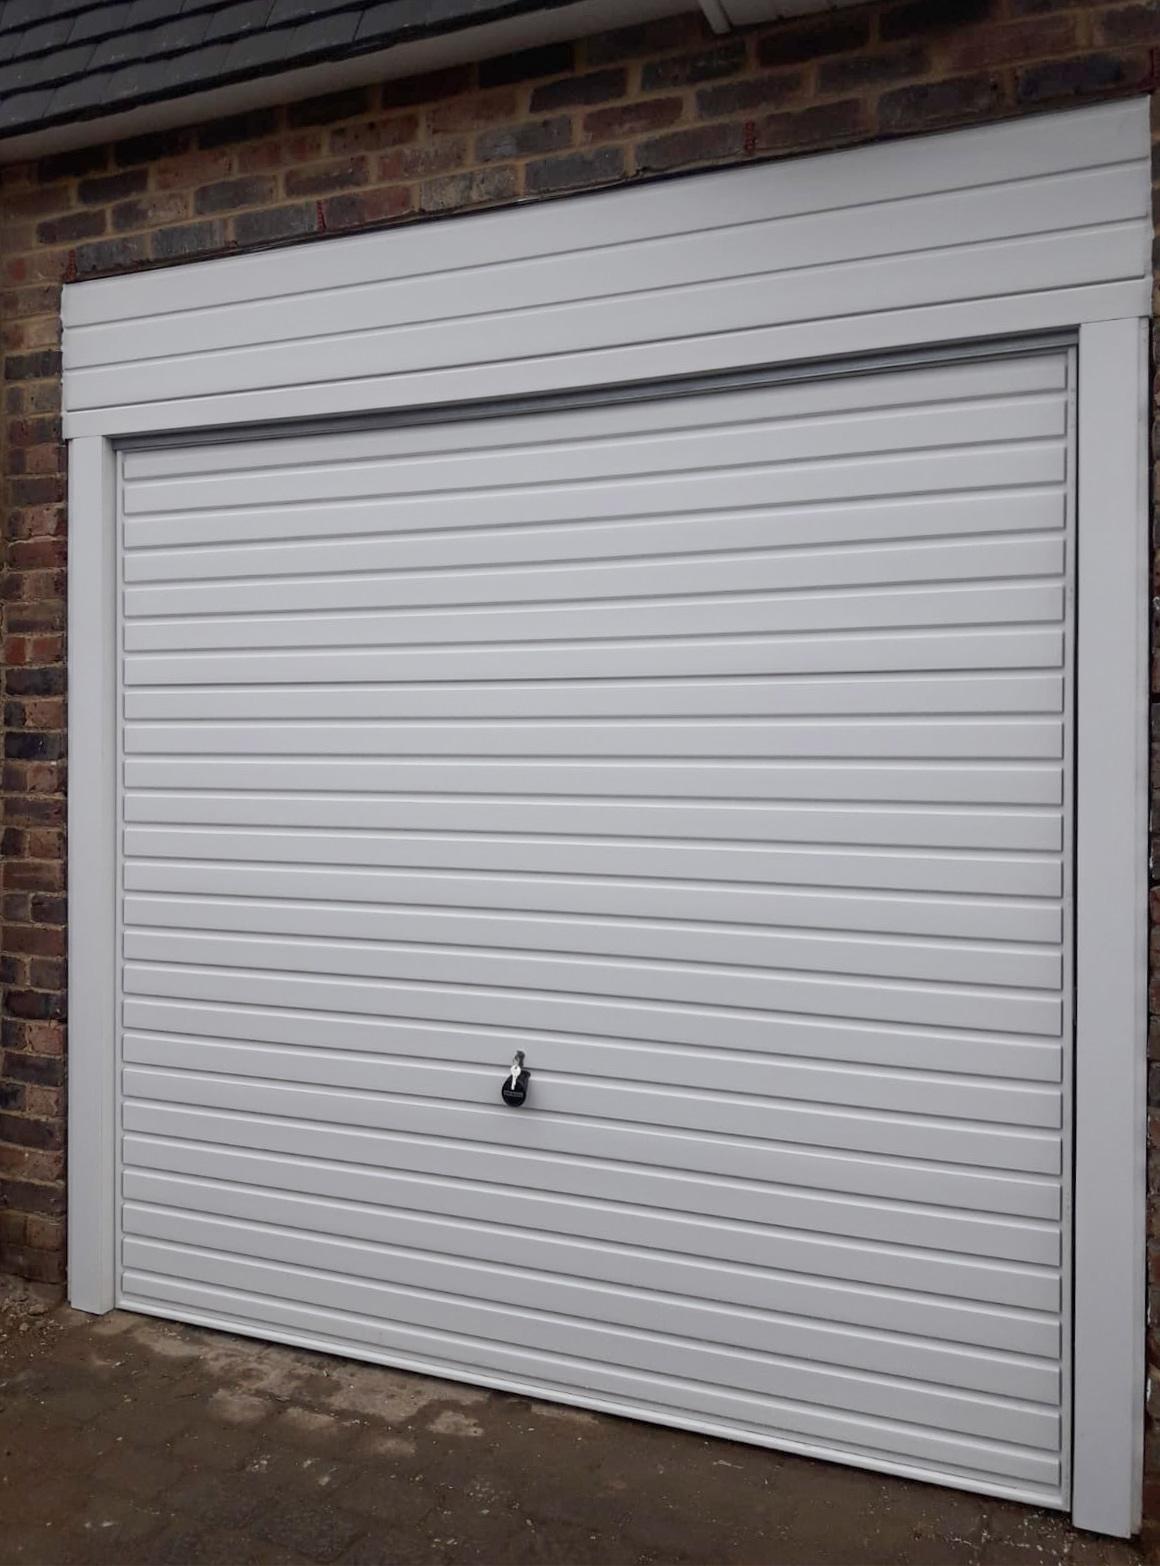 Hormann 2002 Steel Up & Over Horizontal Garage Door Finished in Traffic White